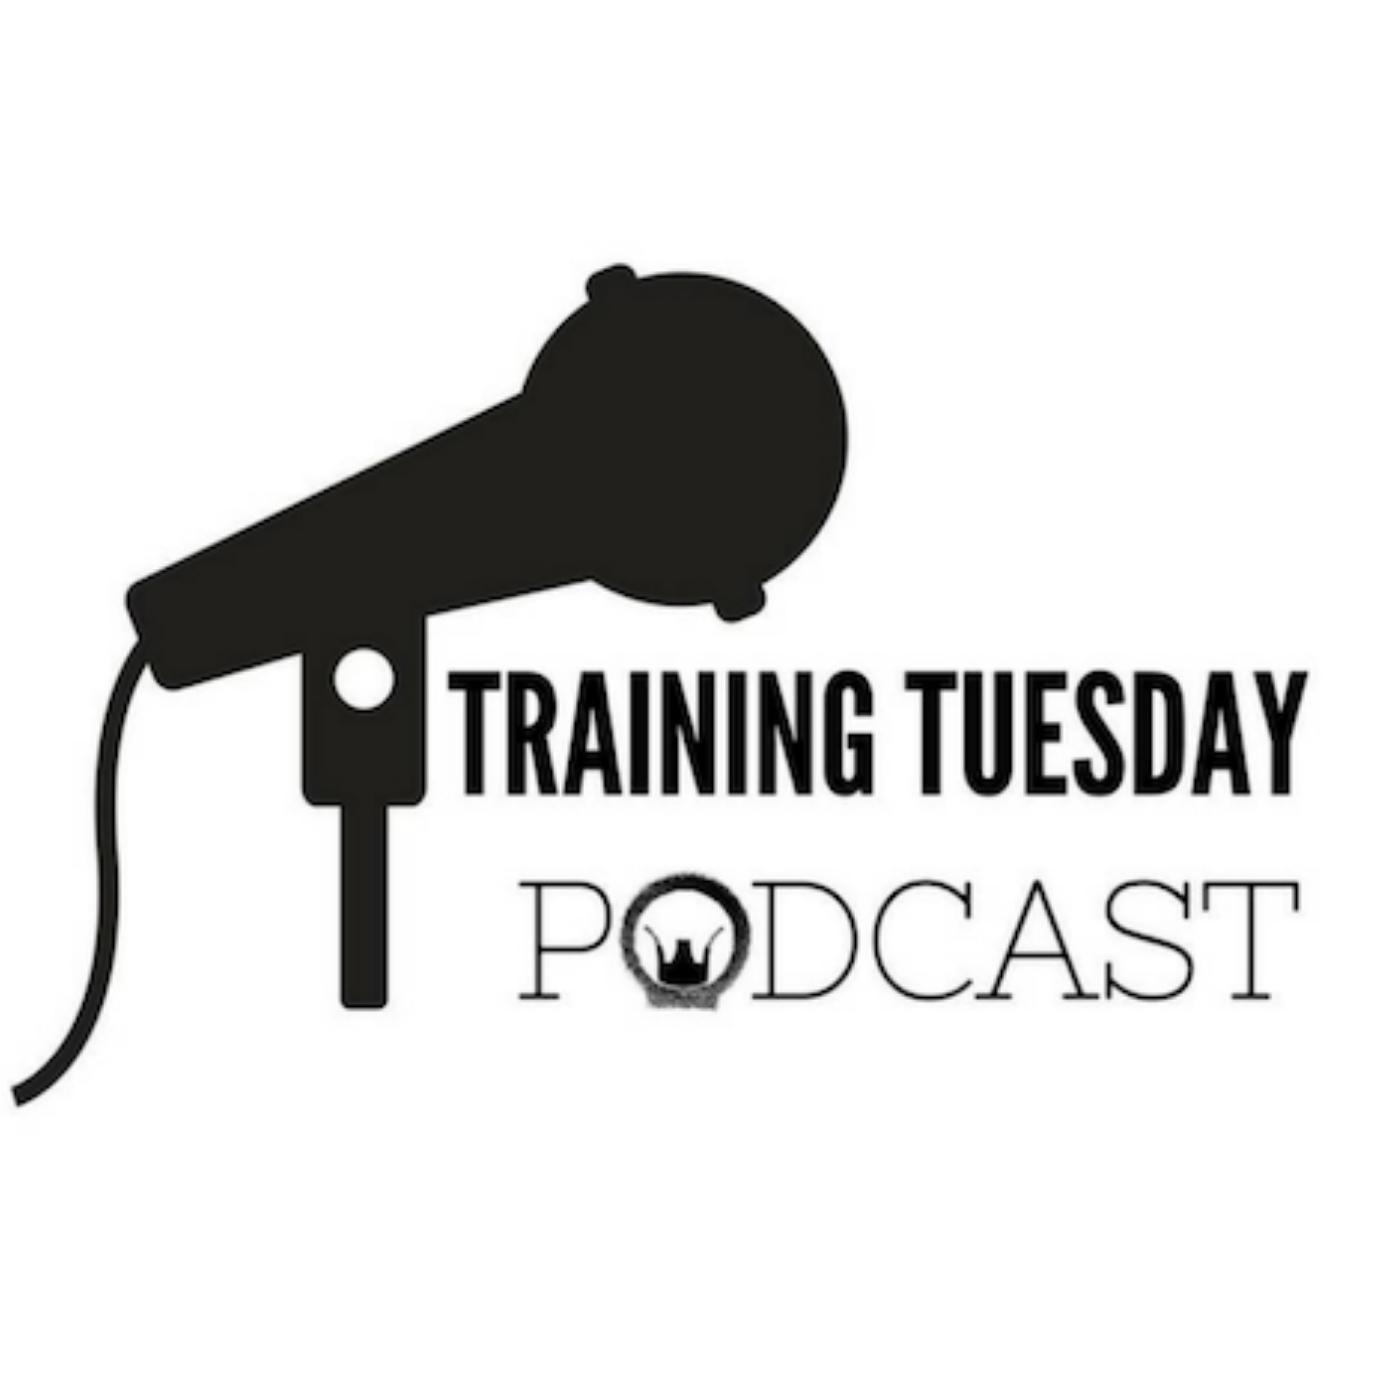 Training Tuesday Podcast